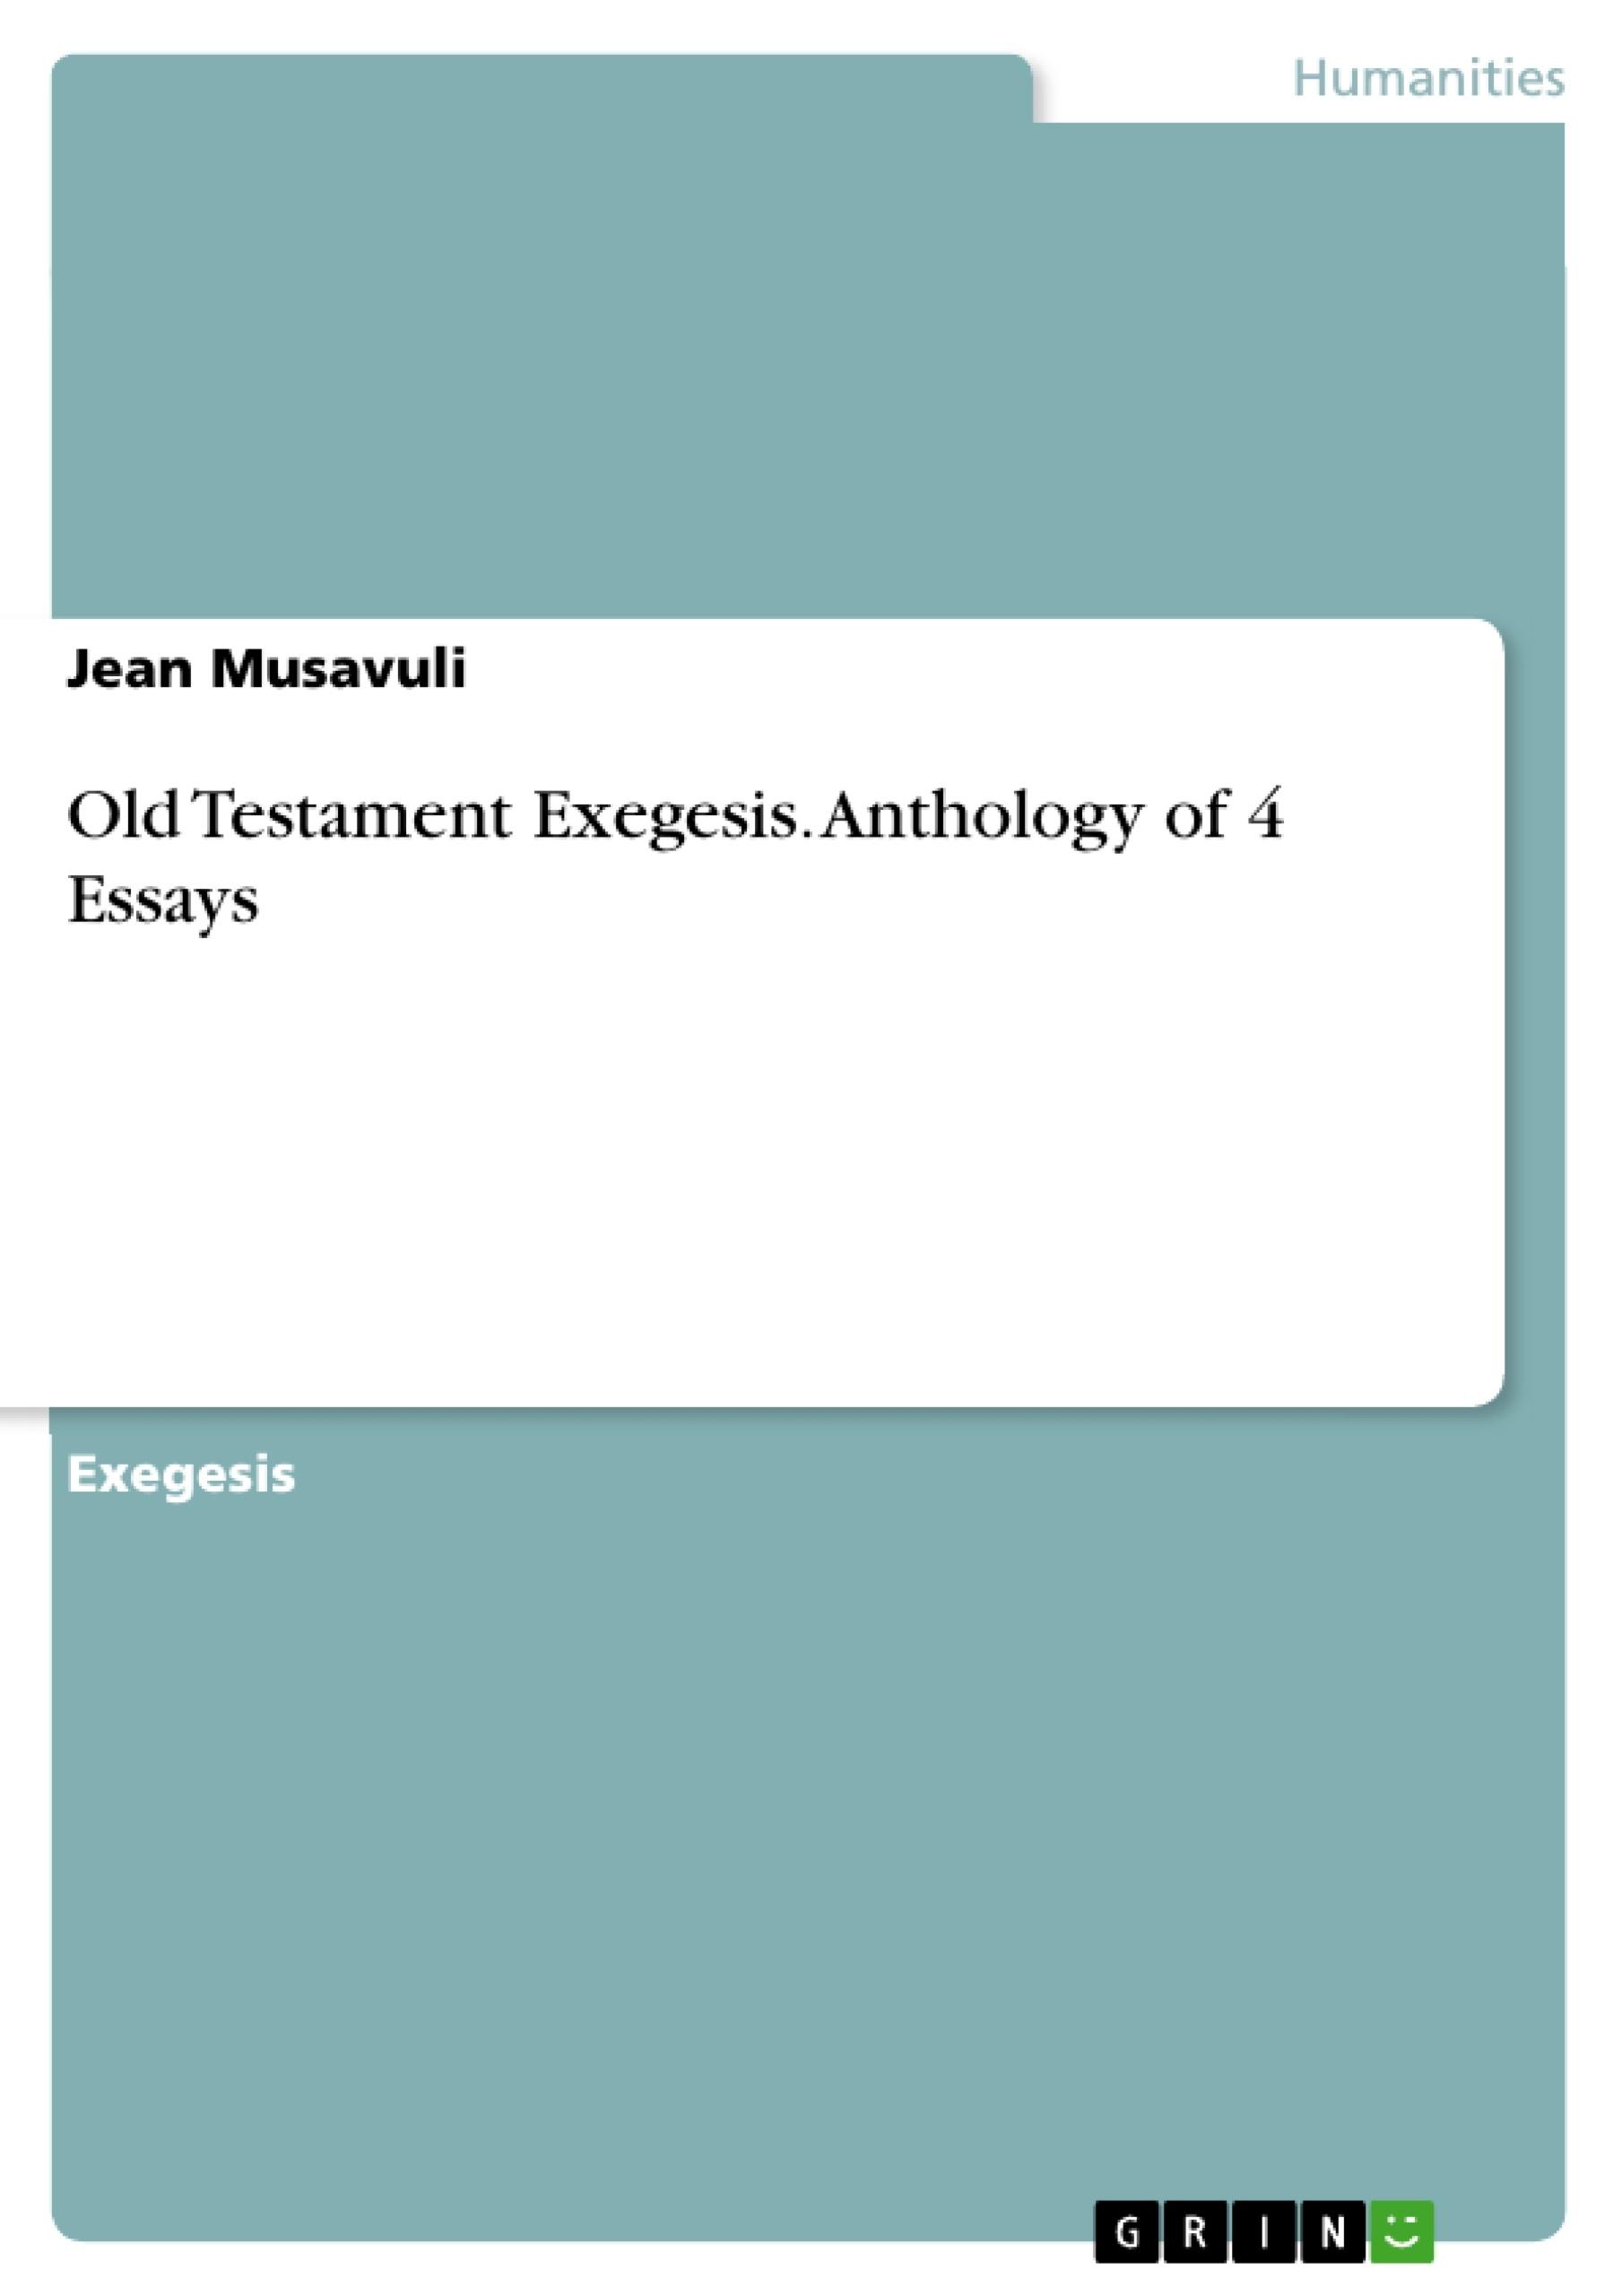 Title: Old Testament Exegesis. Anthology of 4 Essays